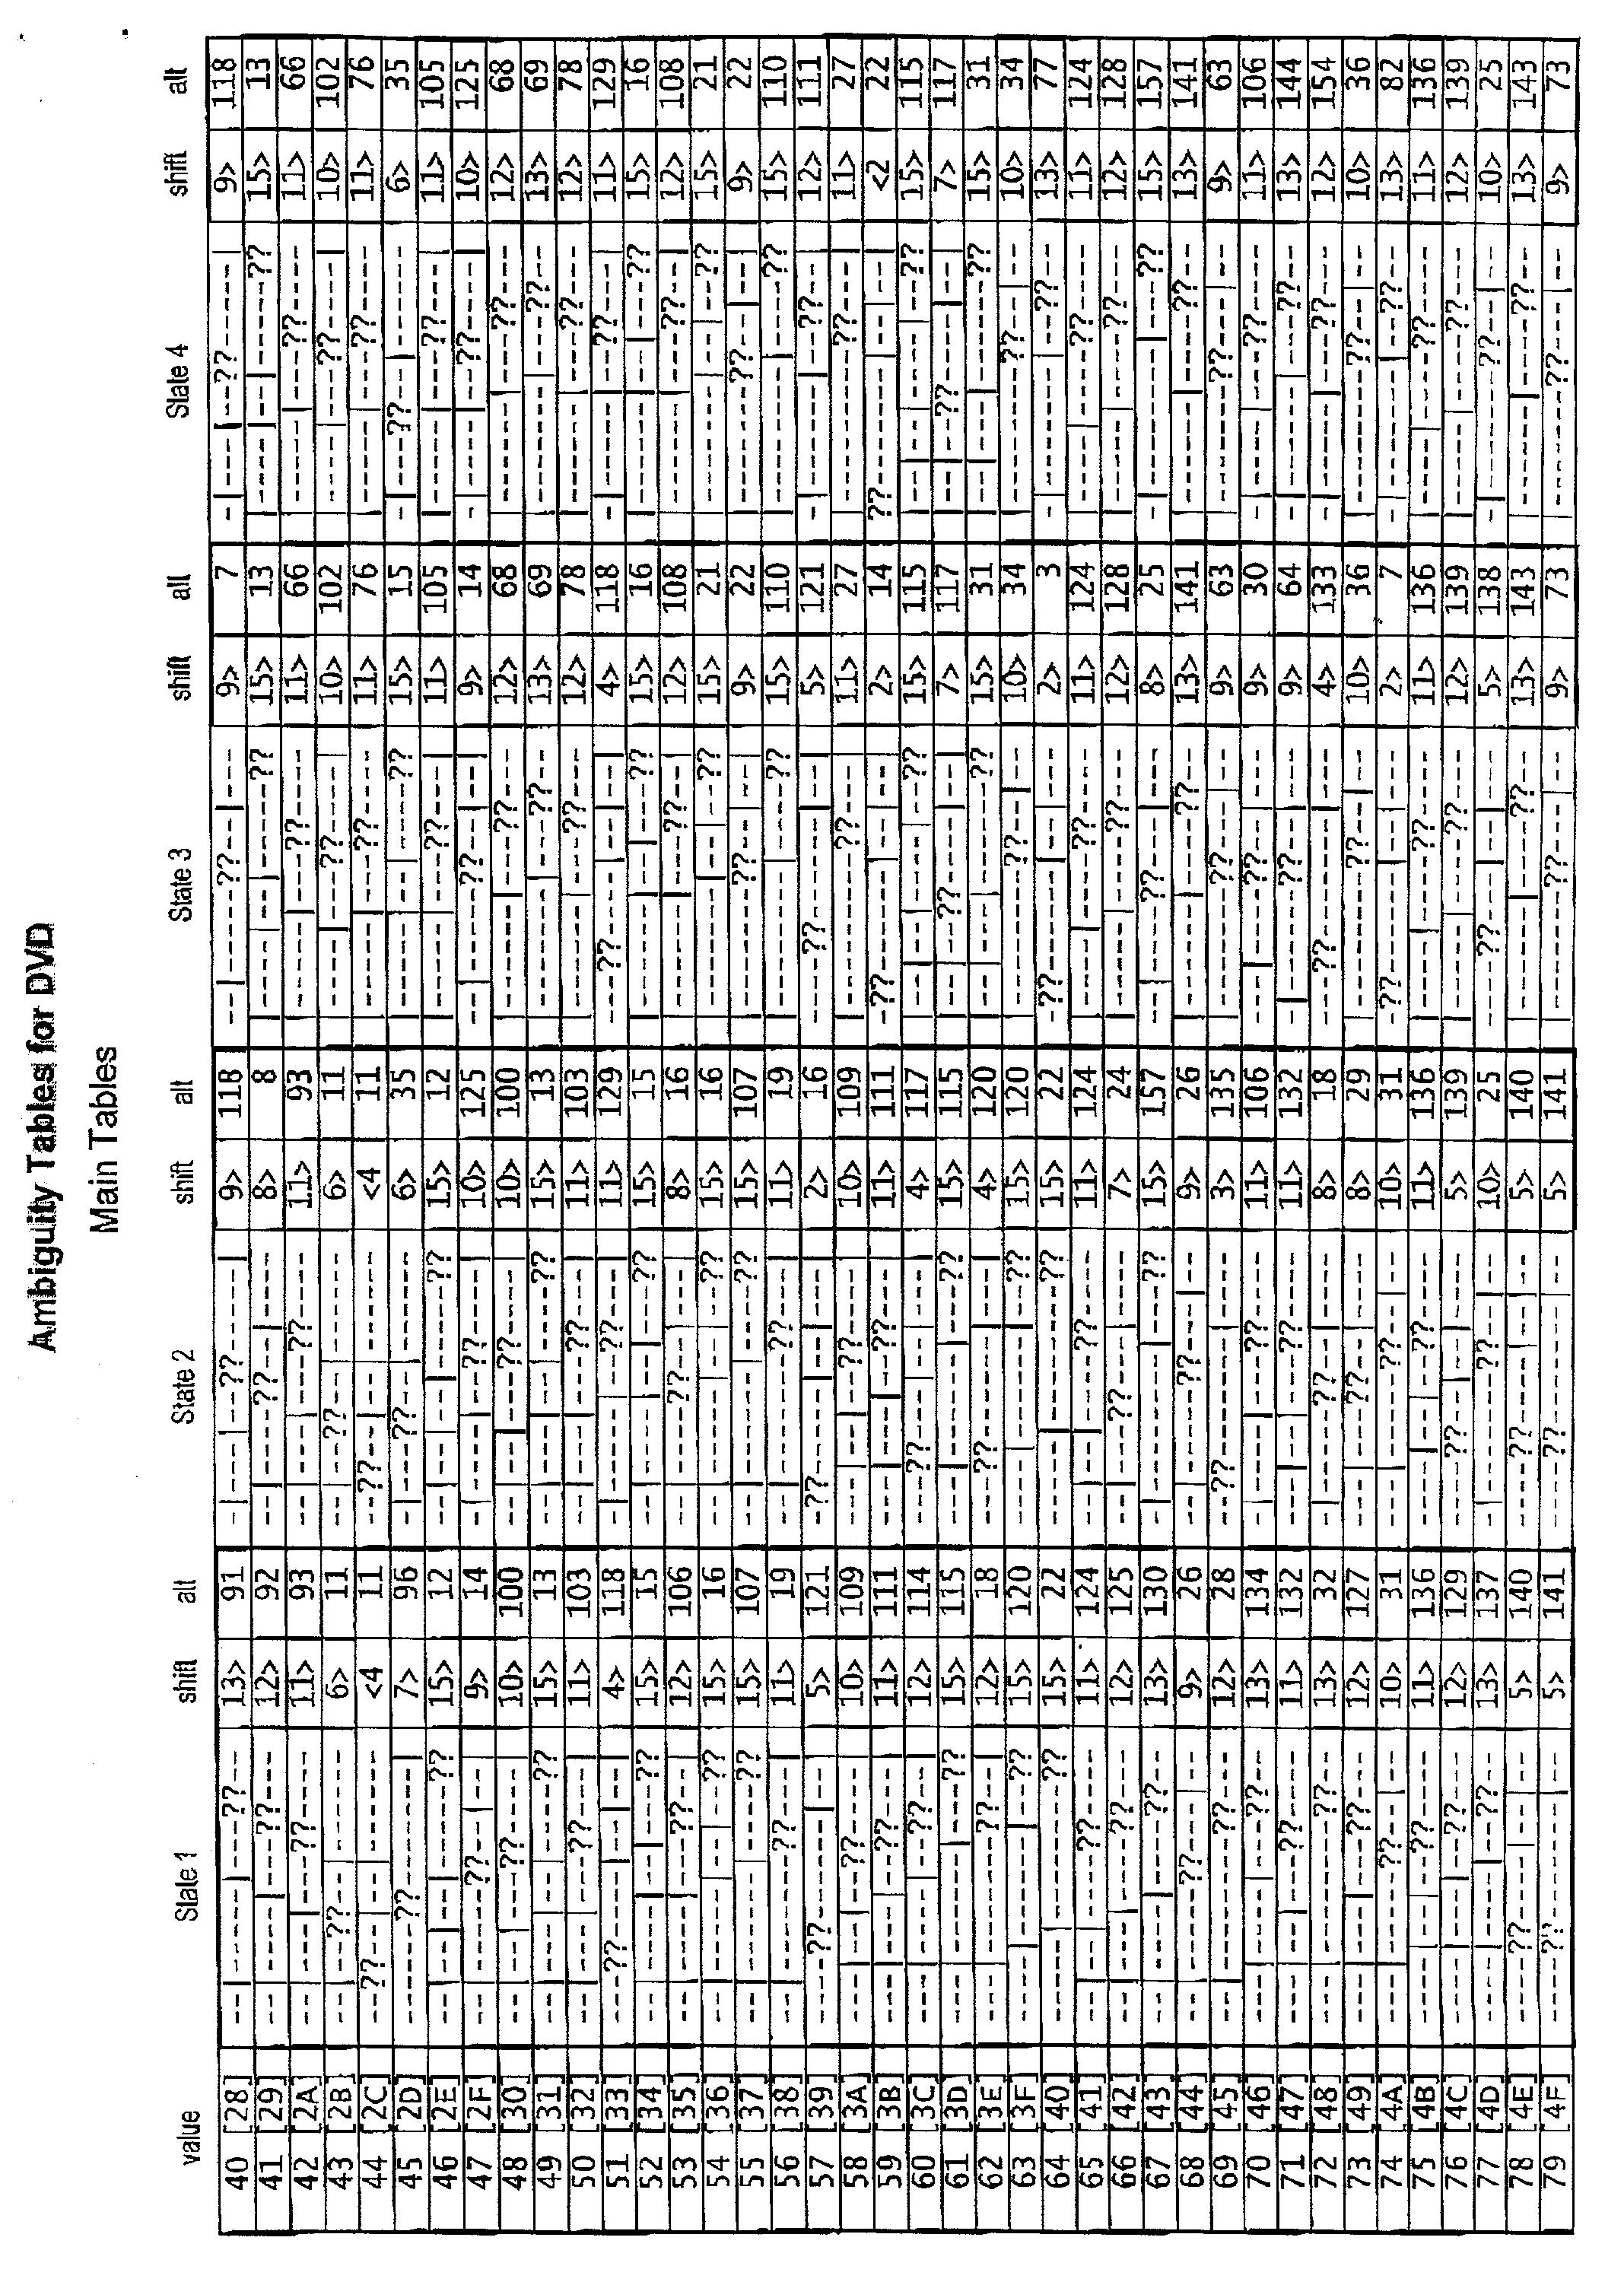 Figure US20020069389A1-20020606-P00003